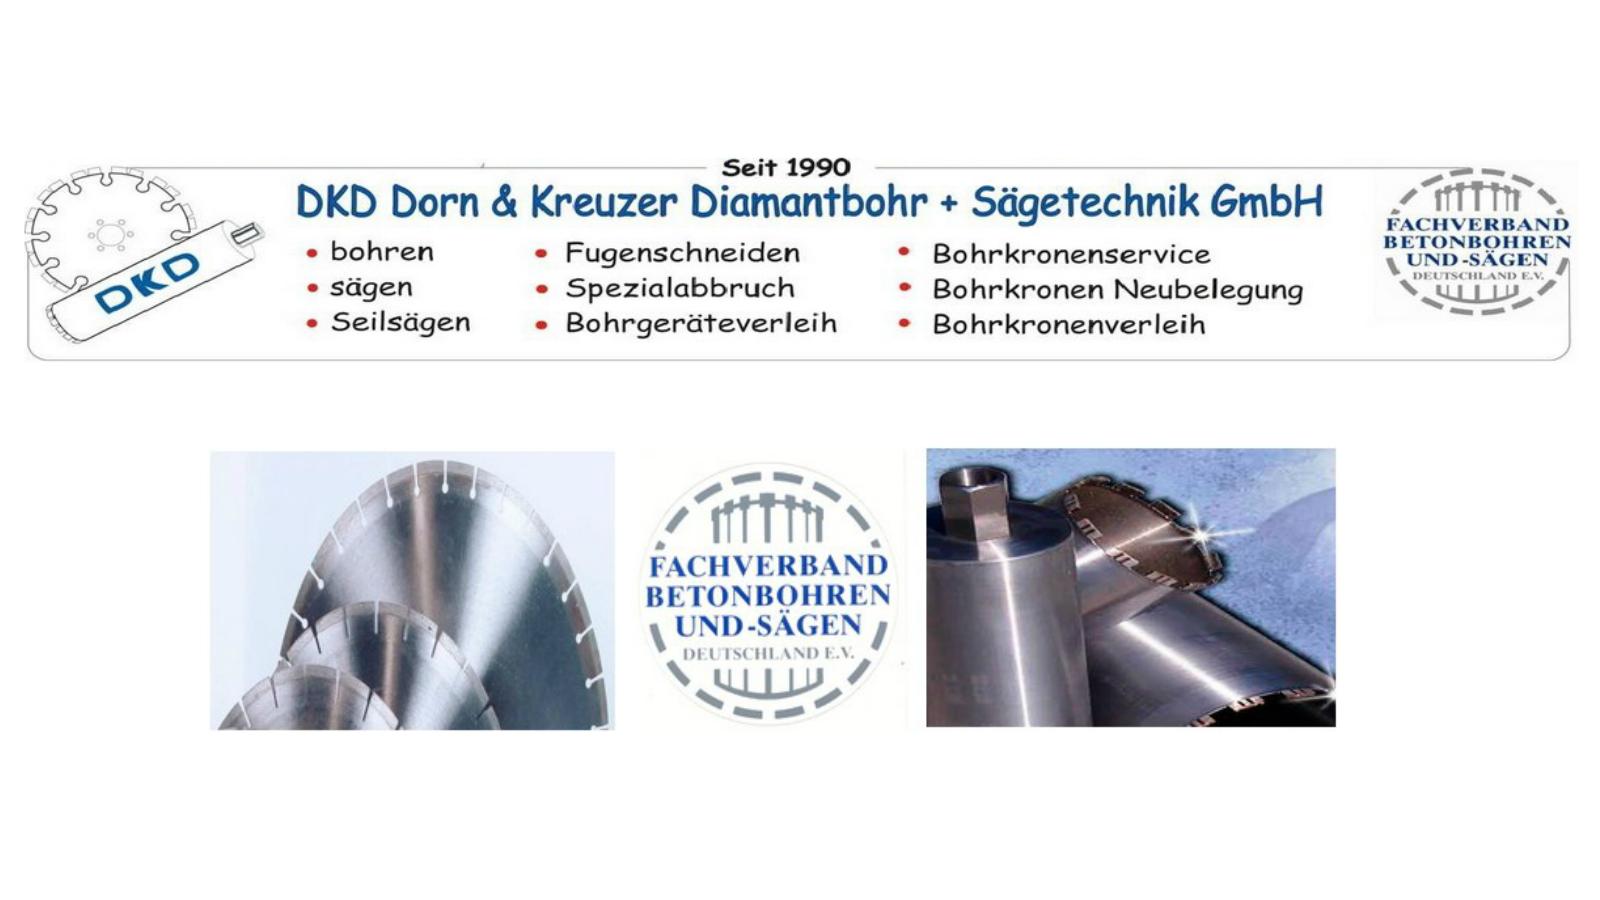 DKD Dorn & Kreuzer Diamantbohr-u. Sägetechnik GmbH